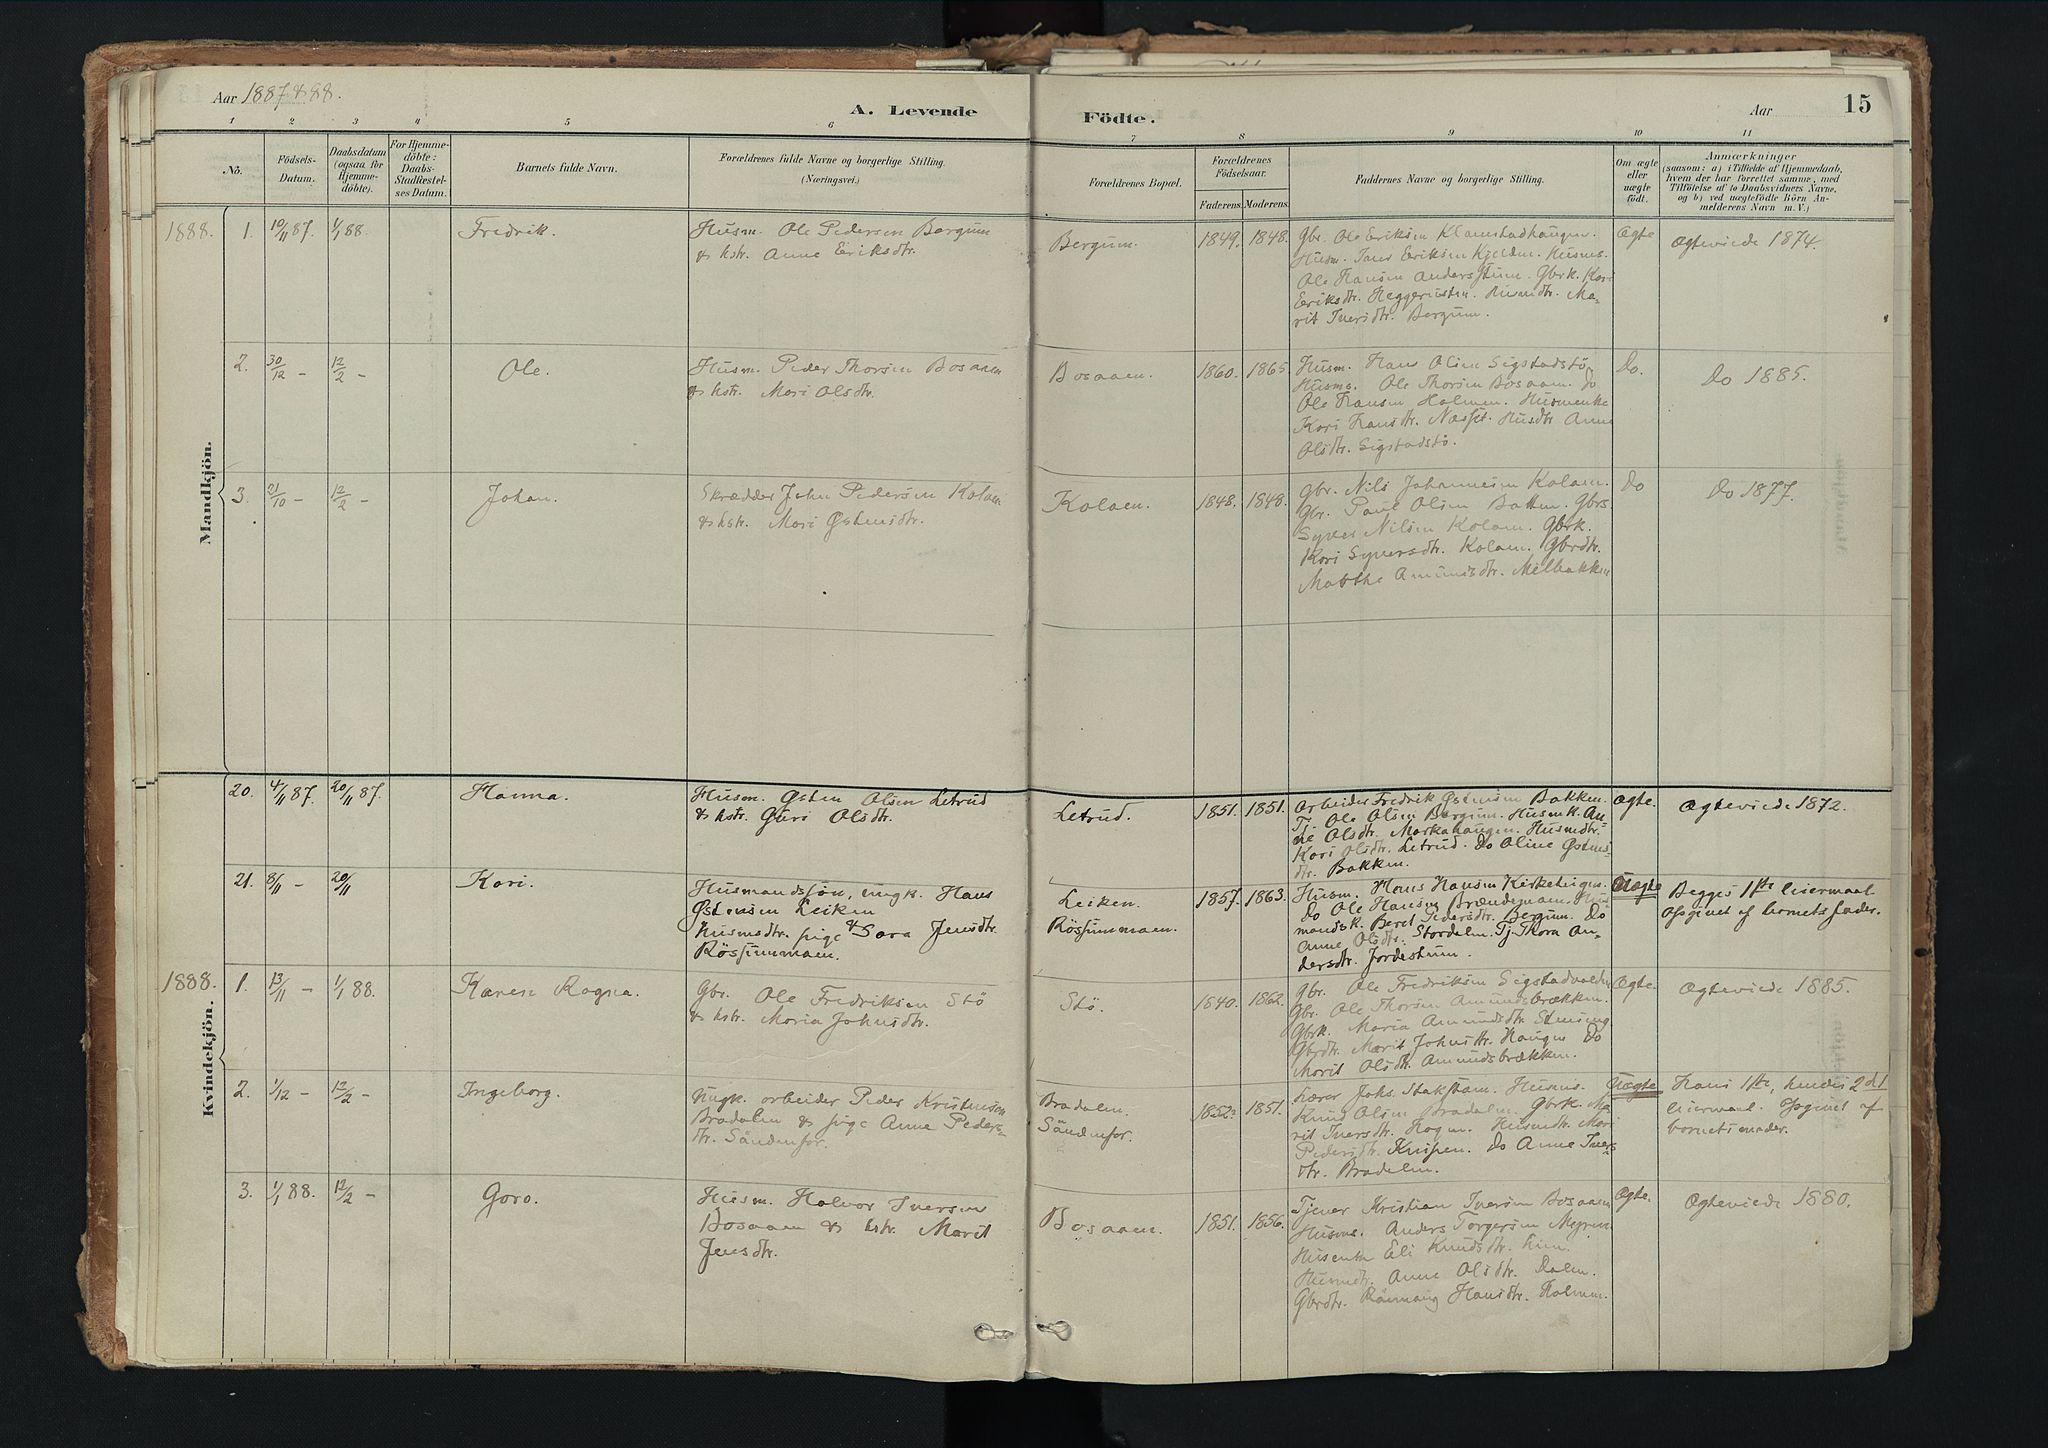 SAH, Nord-Fron prestekontor, Ministerialbok nr. 3, 1884-1914, s. 15